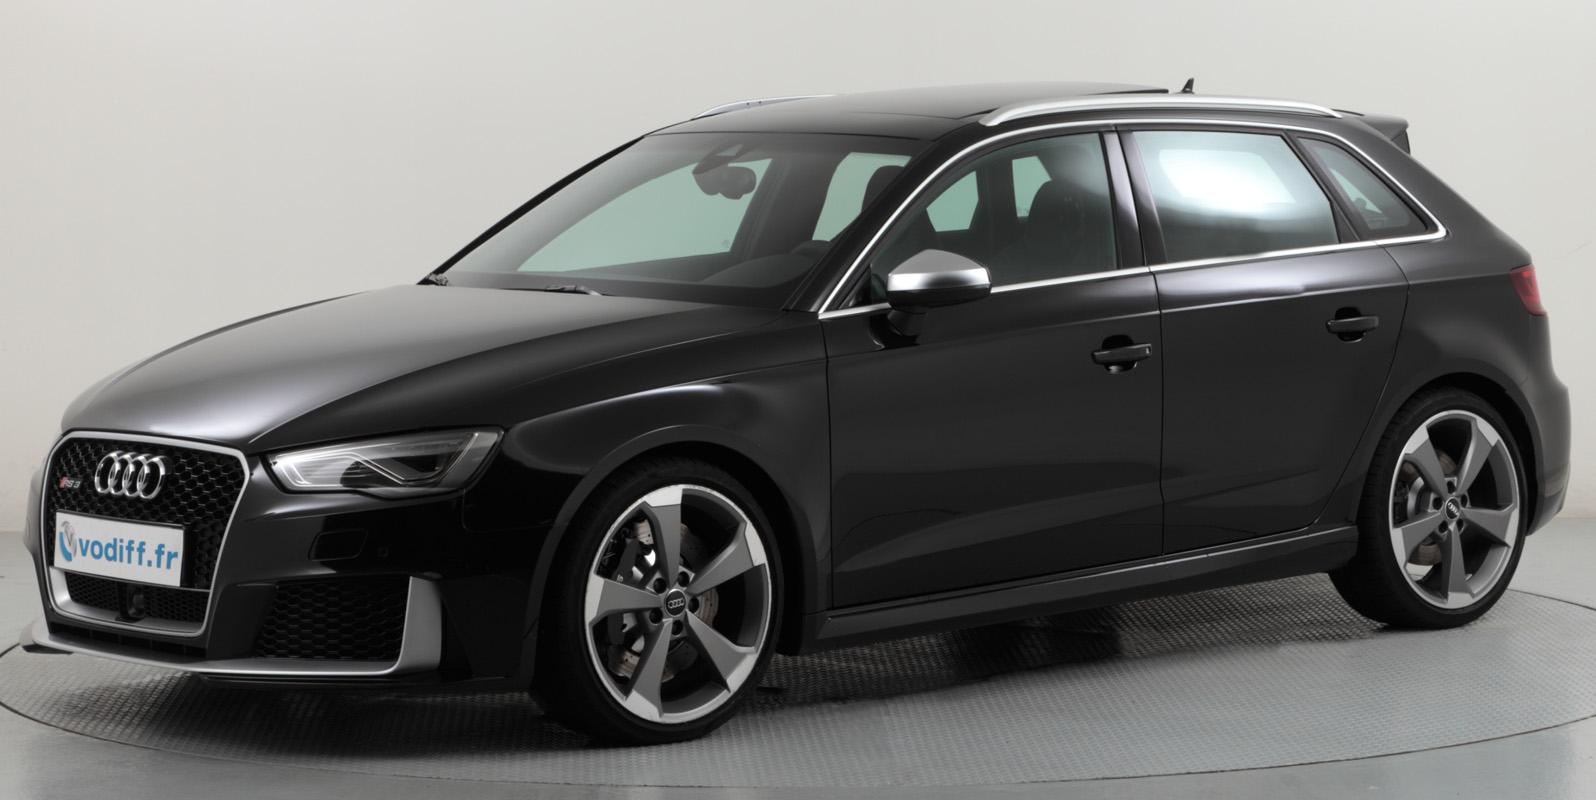 audi rs3 sportback nouveau modele 2 5 tfsi quattro 367 cv s tronic neuf 72 600 euros mod 2016. Black Bedroom Furniture Sets. Home Design Ideas